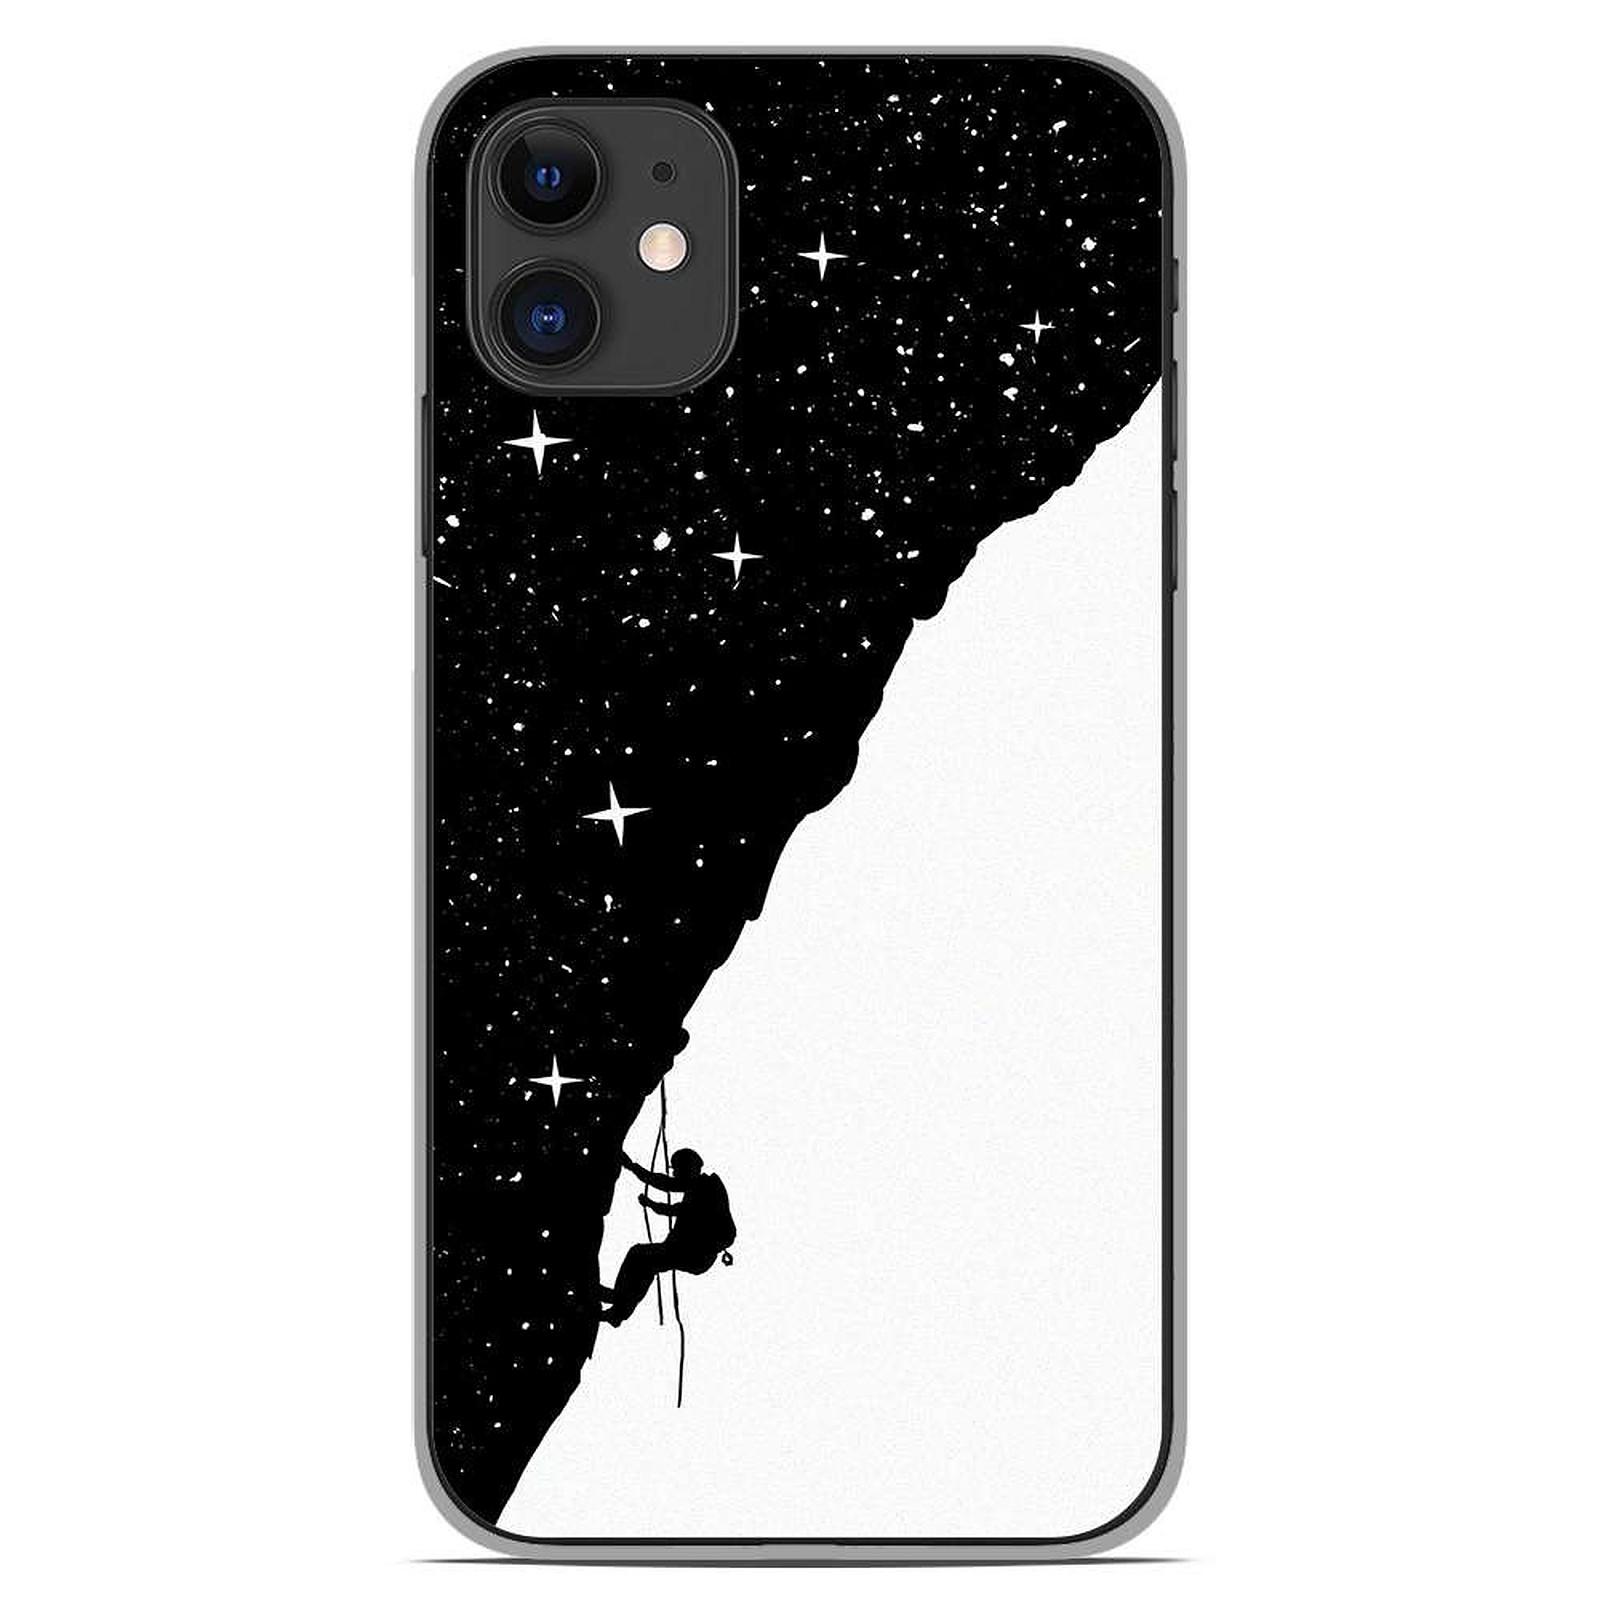 1001 Coques Coque silicone gel Apple iPhone 11 motif BS Nightclimbing